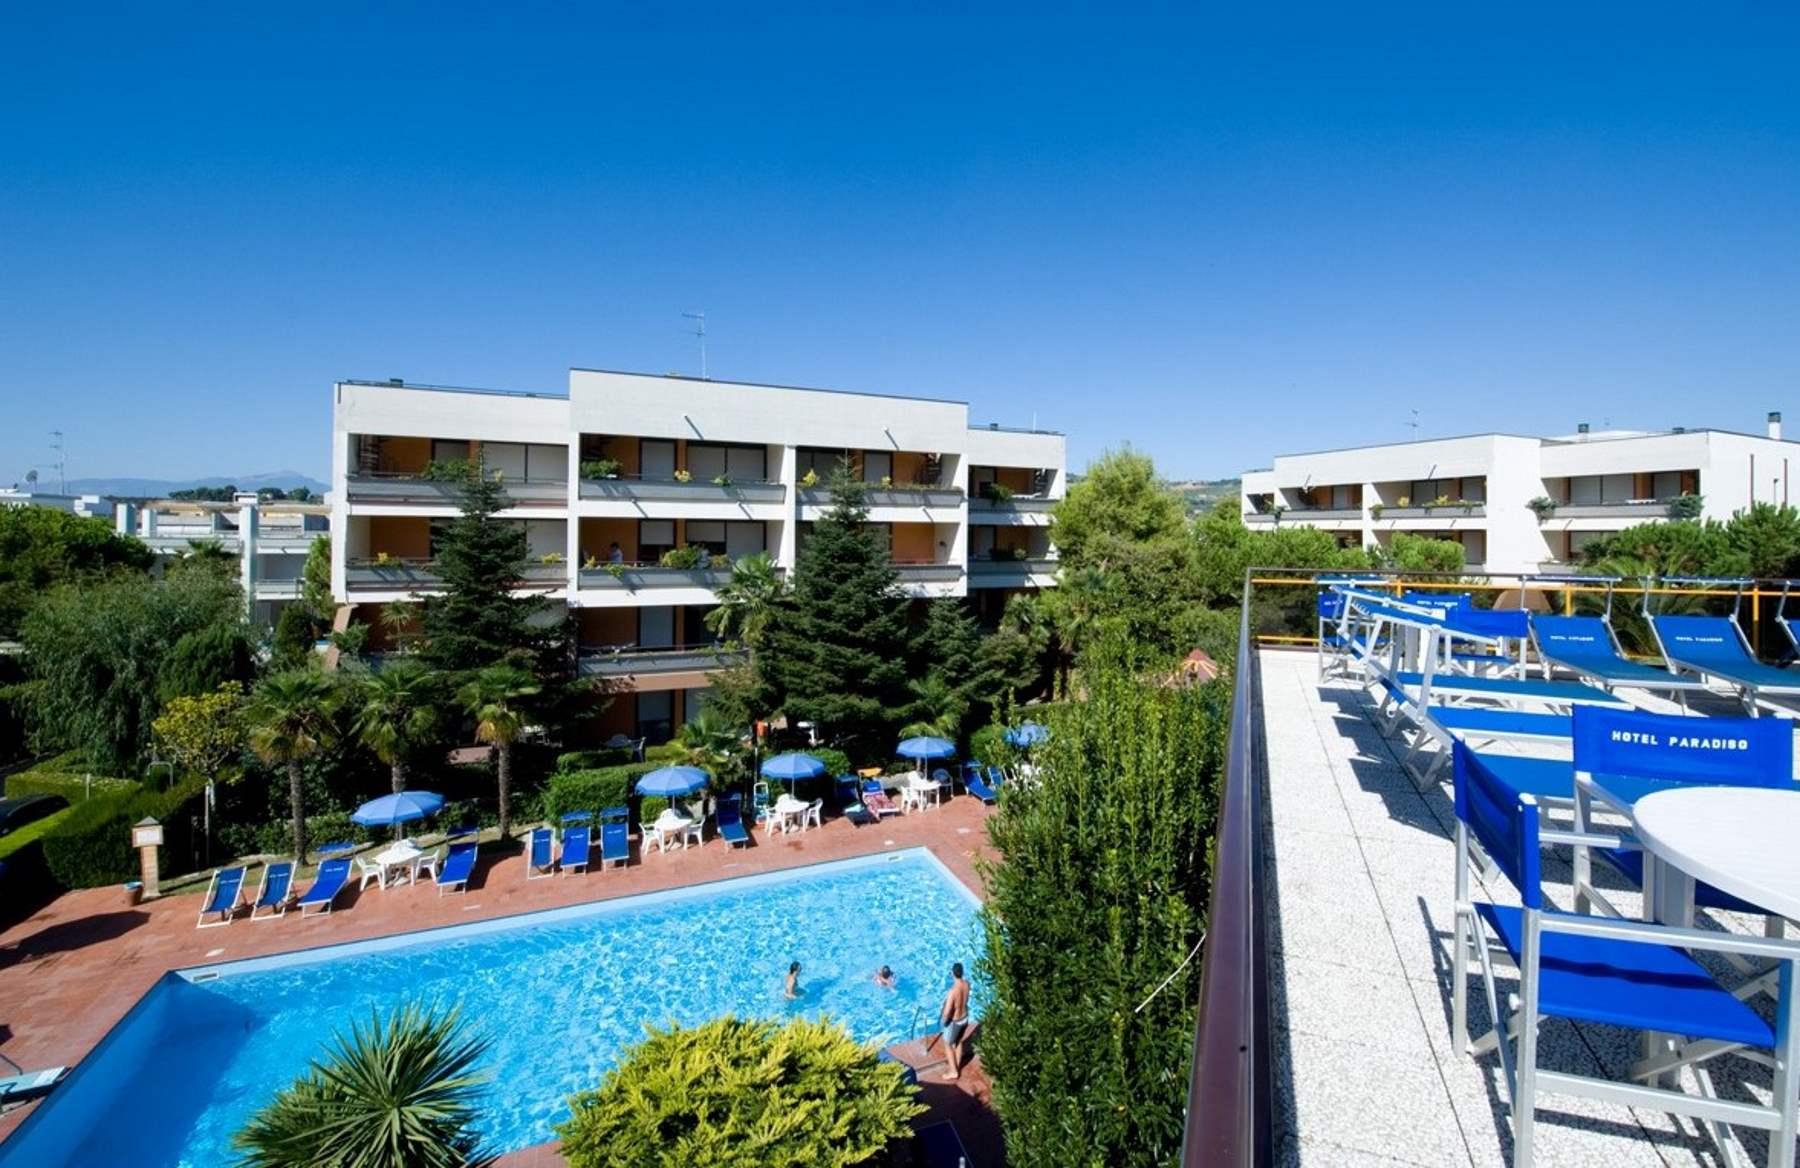 Residence hotel paradiso hotel e residence per famiglie - Hotel con piscina abruzzo ...